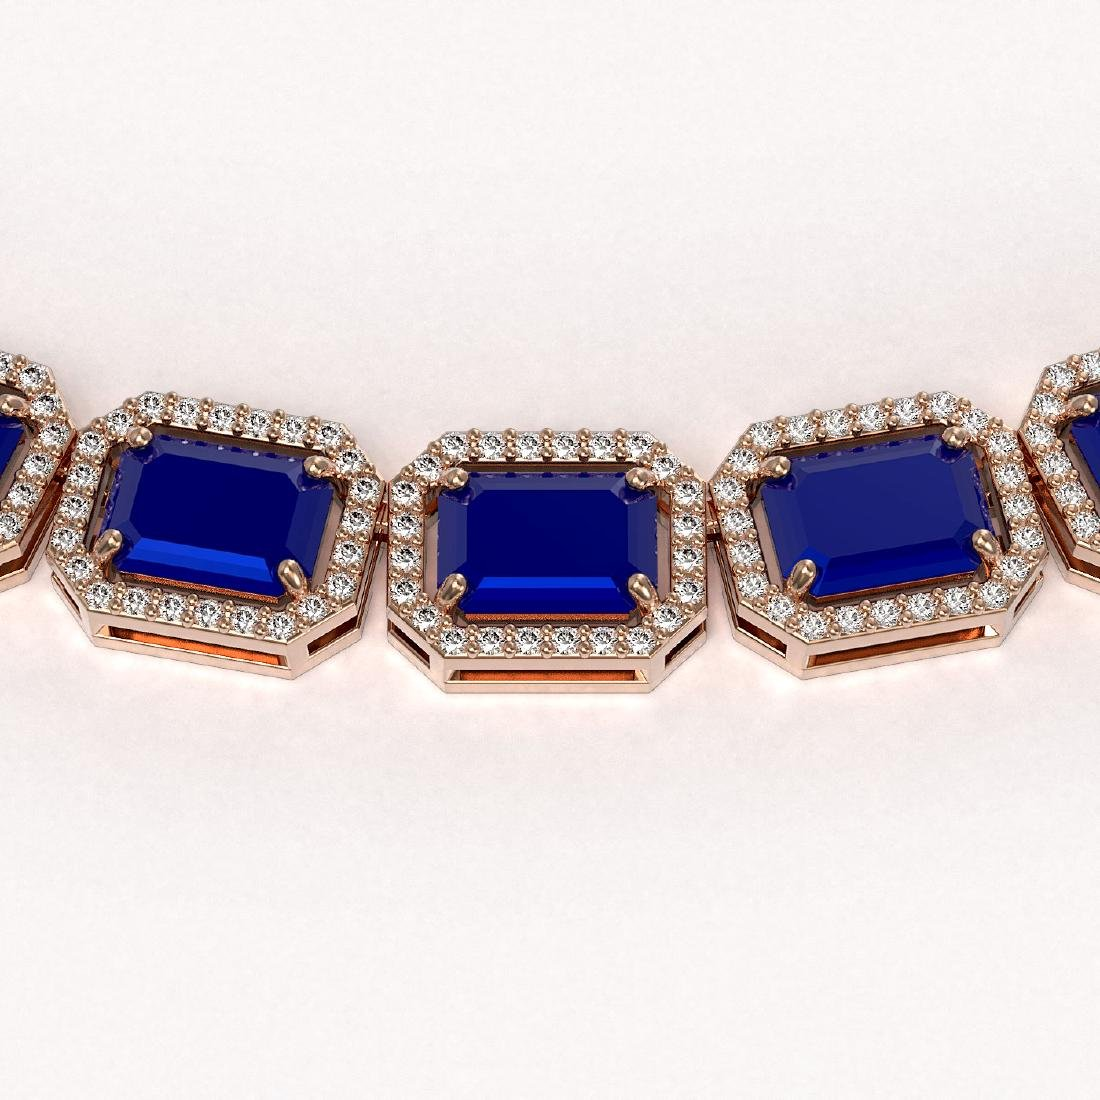 58.59 CTW Sapphire & Diamond Halo Necklace 10K Rose - 3